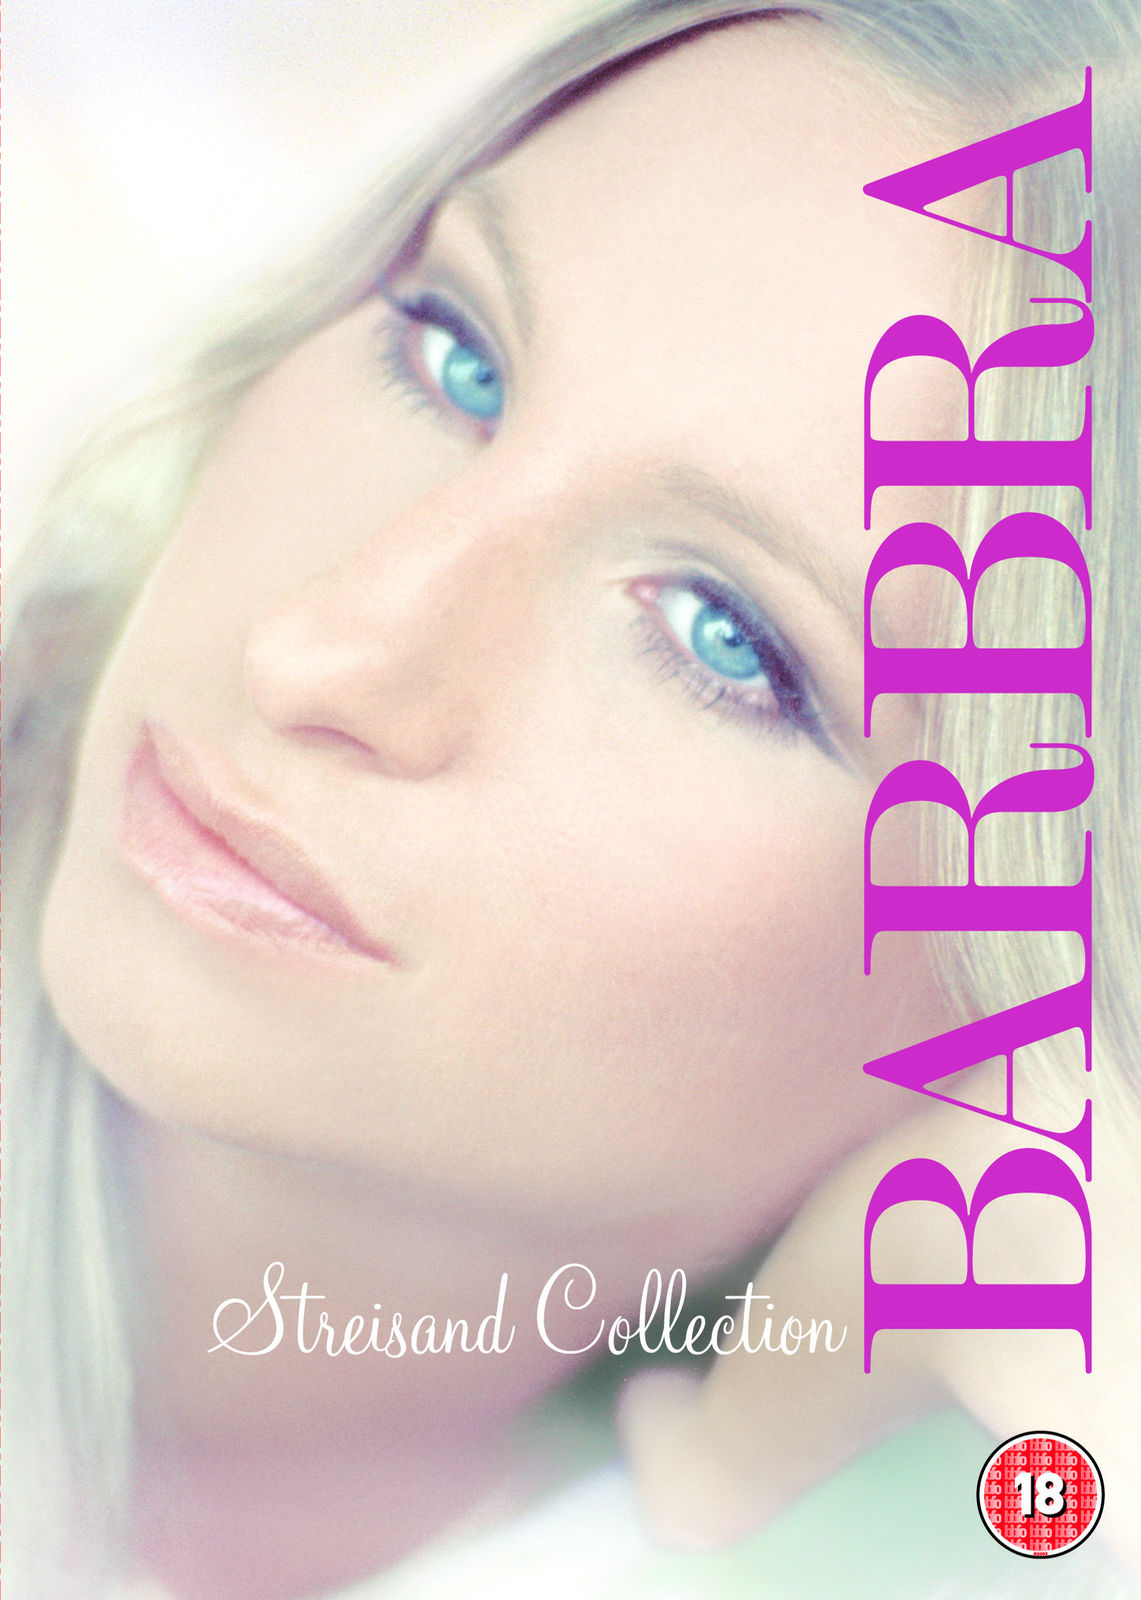 Buy Barbra Streisand Collection Box Set